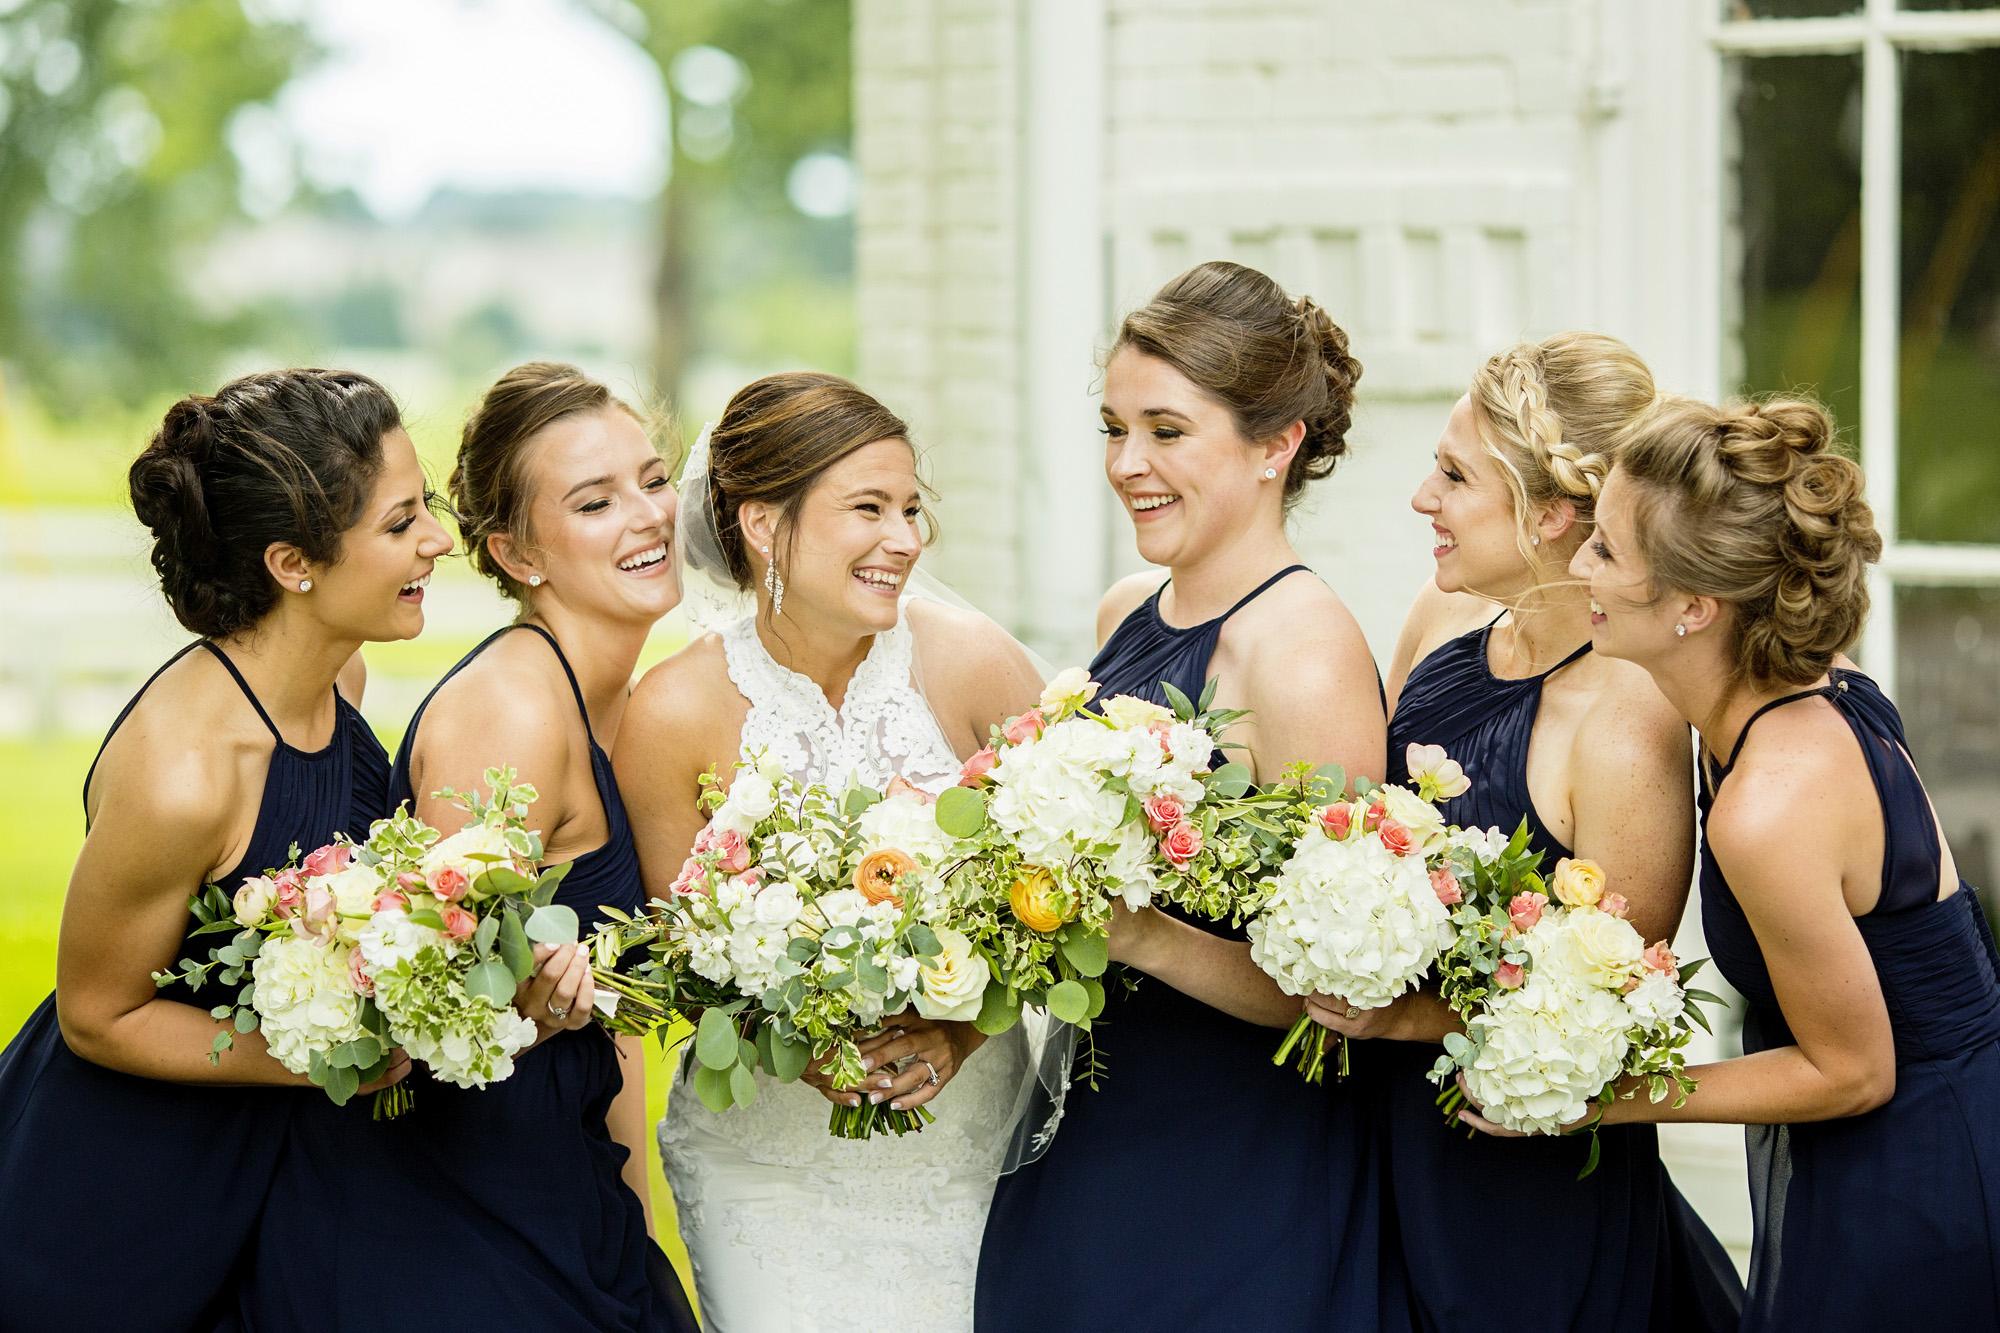 Seriously_Sabrina_Photography_Lexington_Kentucky_Round_Barn_Red_Mile_Stable_of_Memories_Wedding_Hart_48.jpg